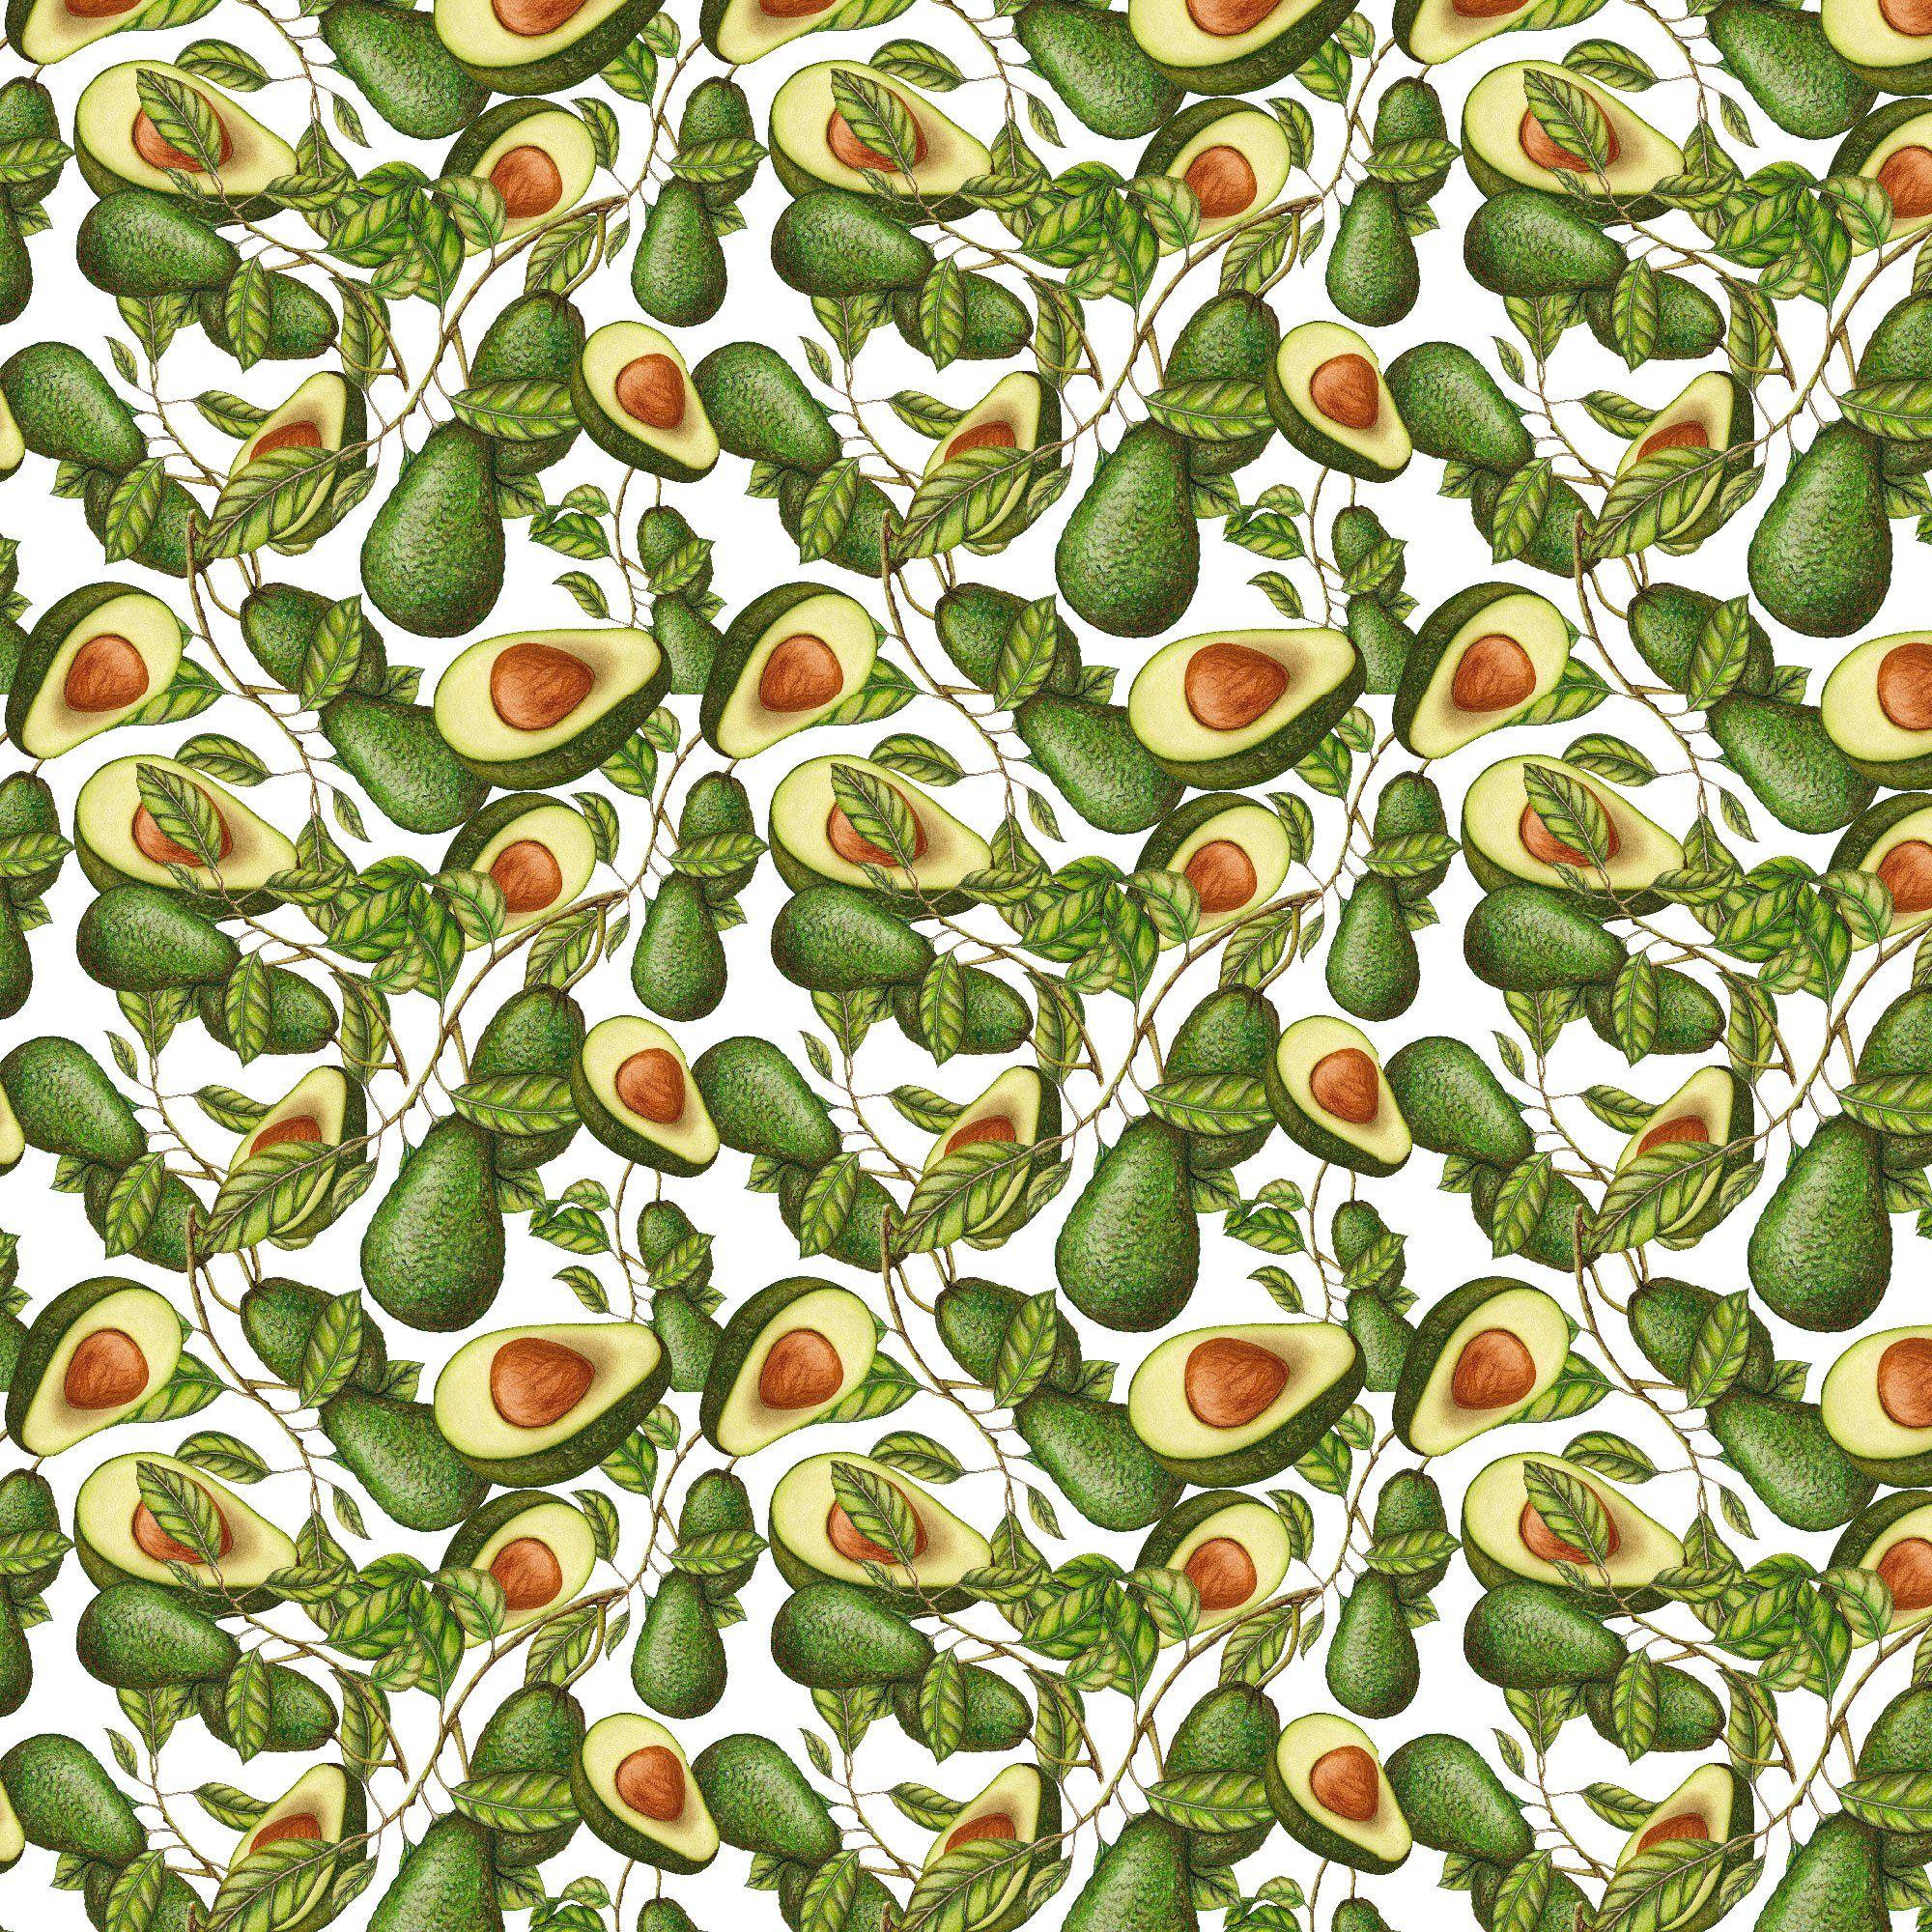 Avocado Wallpaper Fabric WallSkins. Peel. Stick. Remove